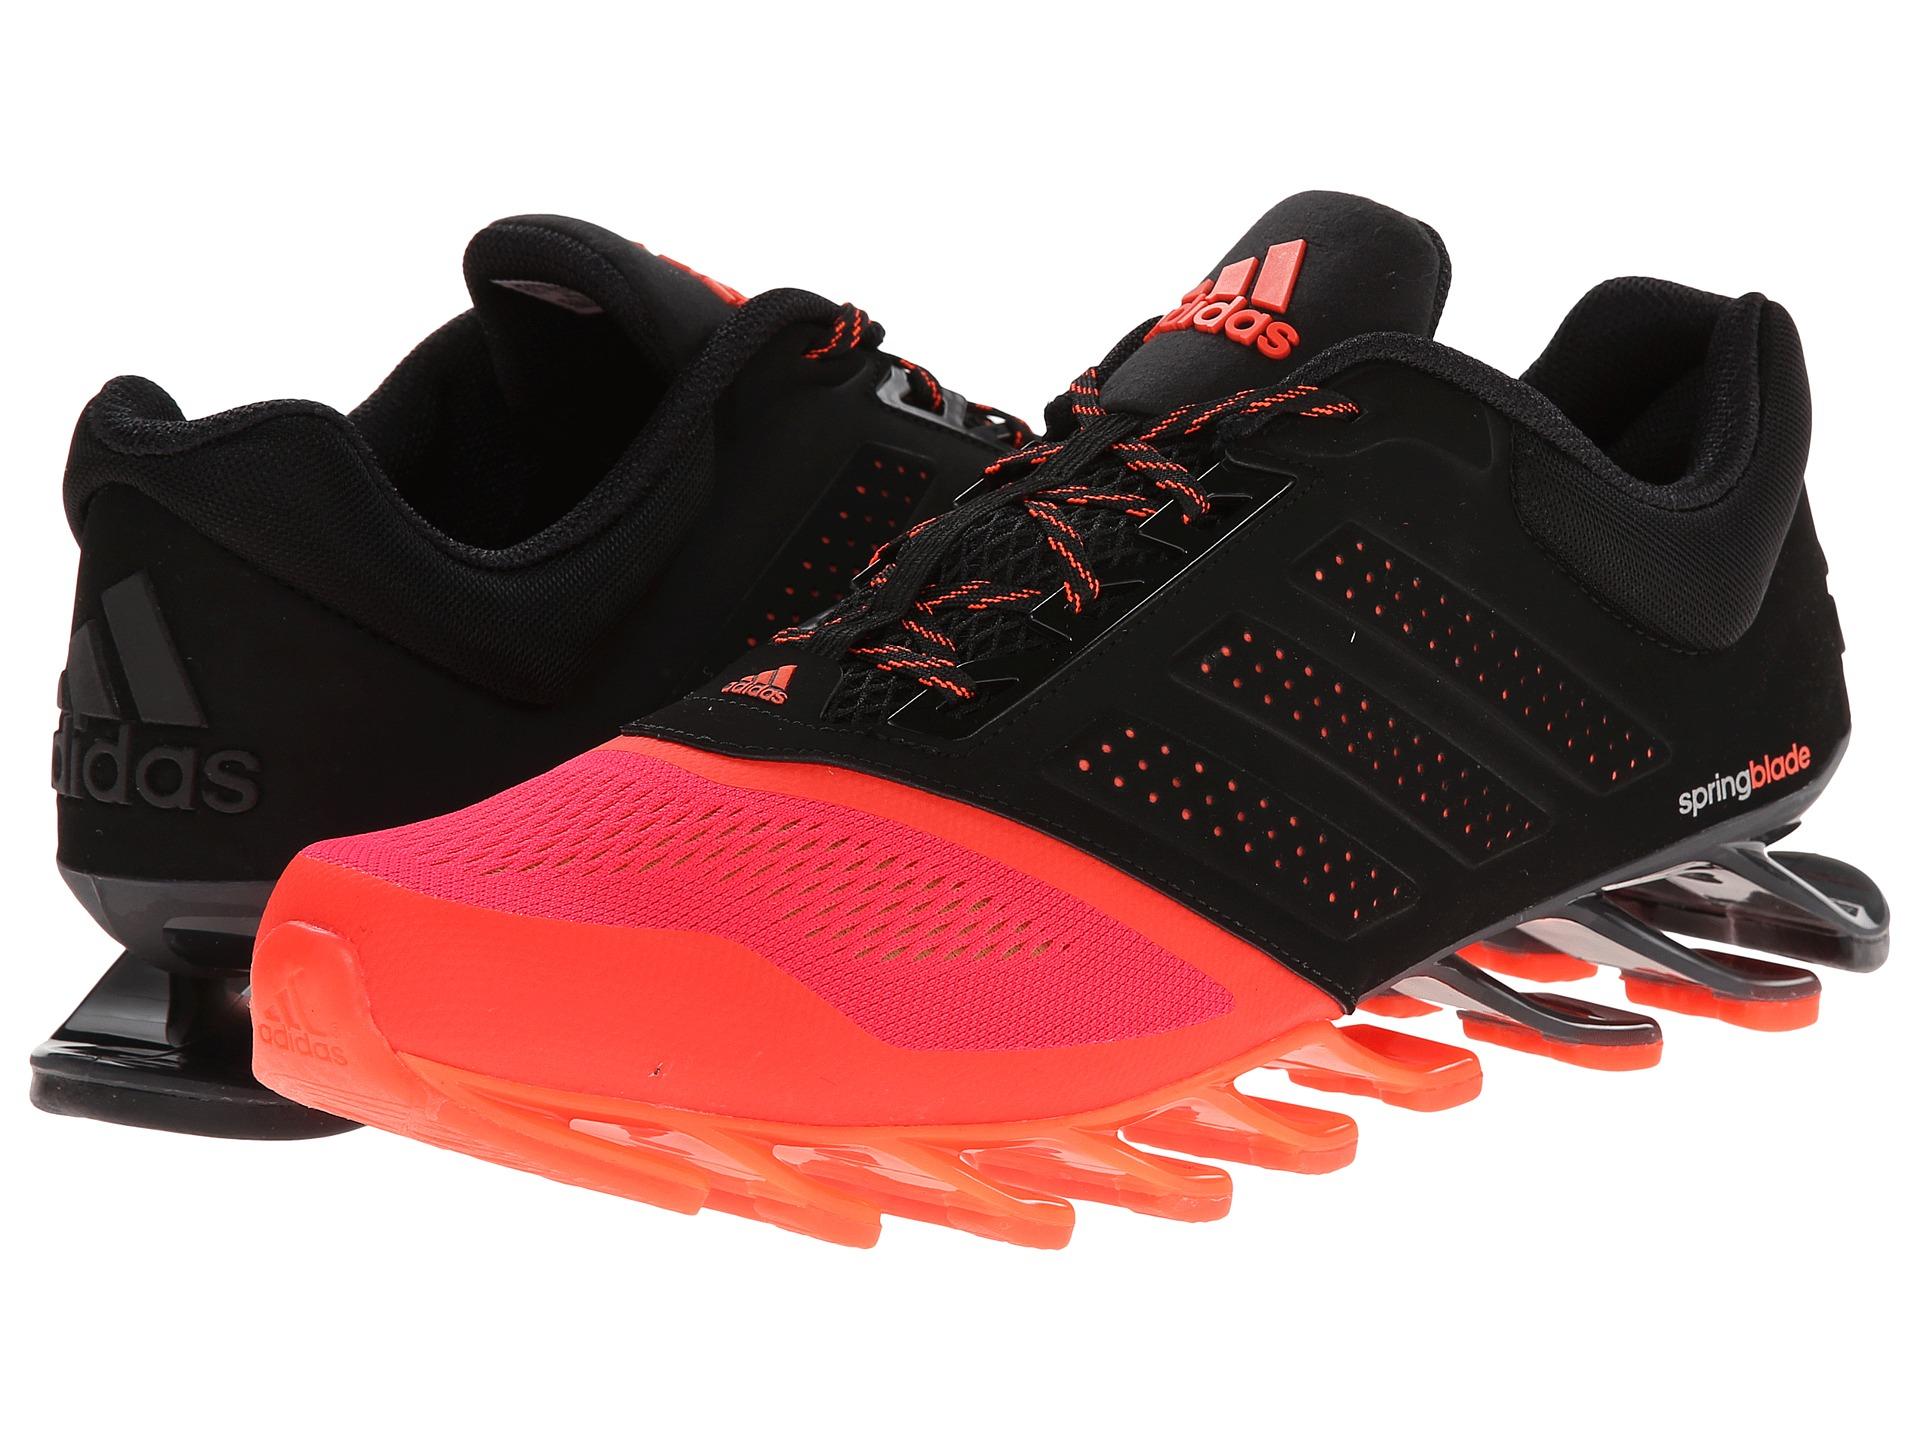 Lyst - adidas Springblade Split M in Red for Men b4253dfa7e